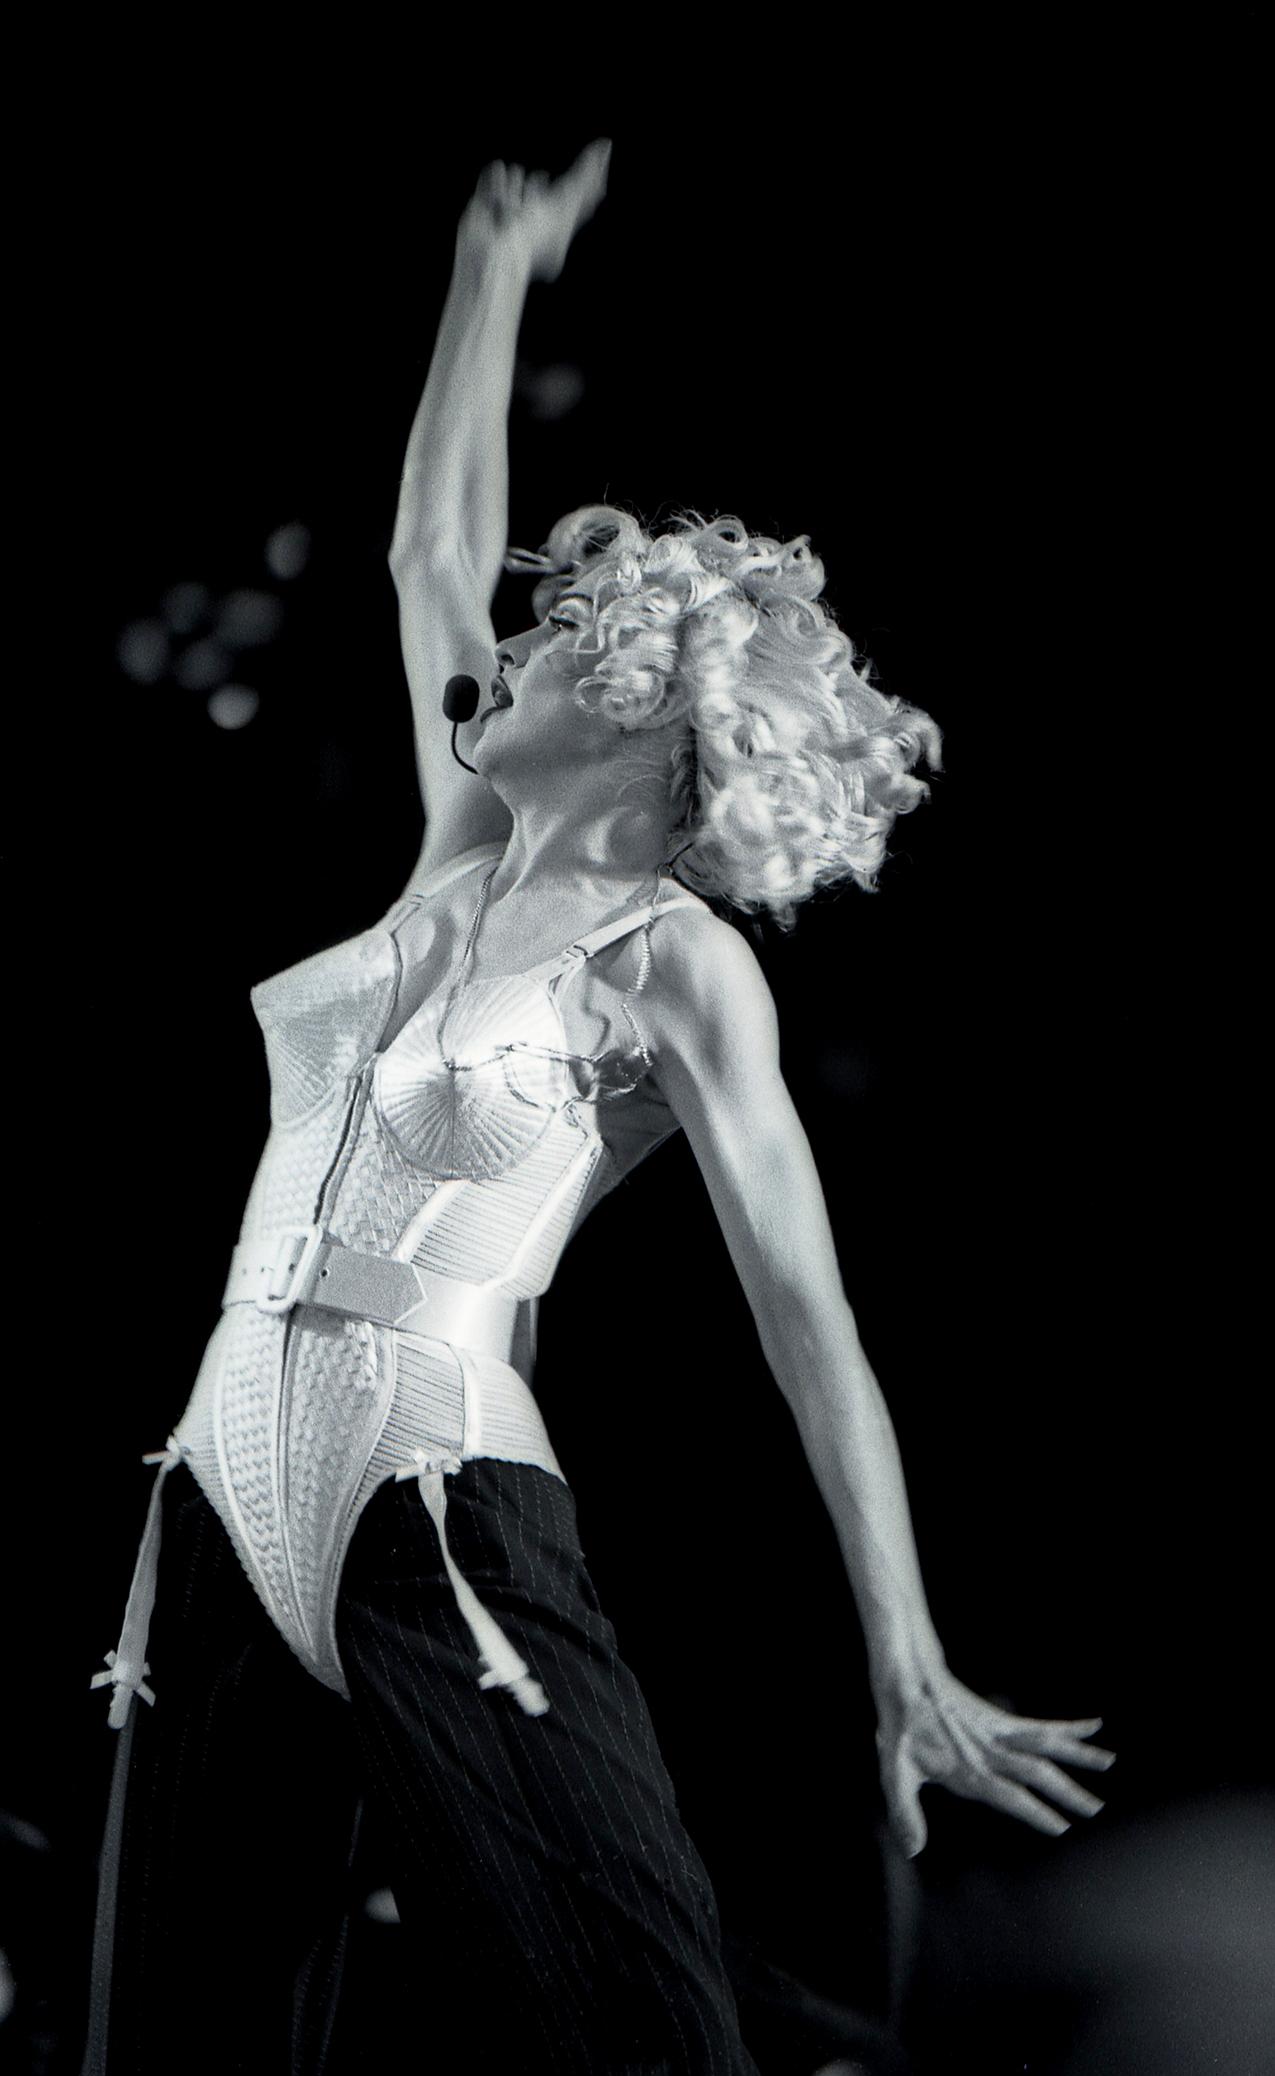 Madonna performs live